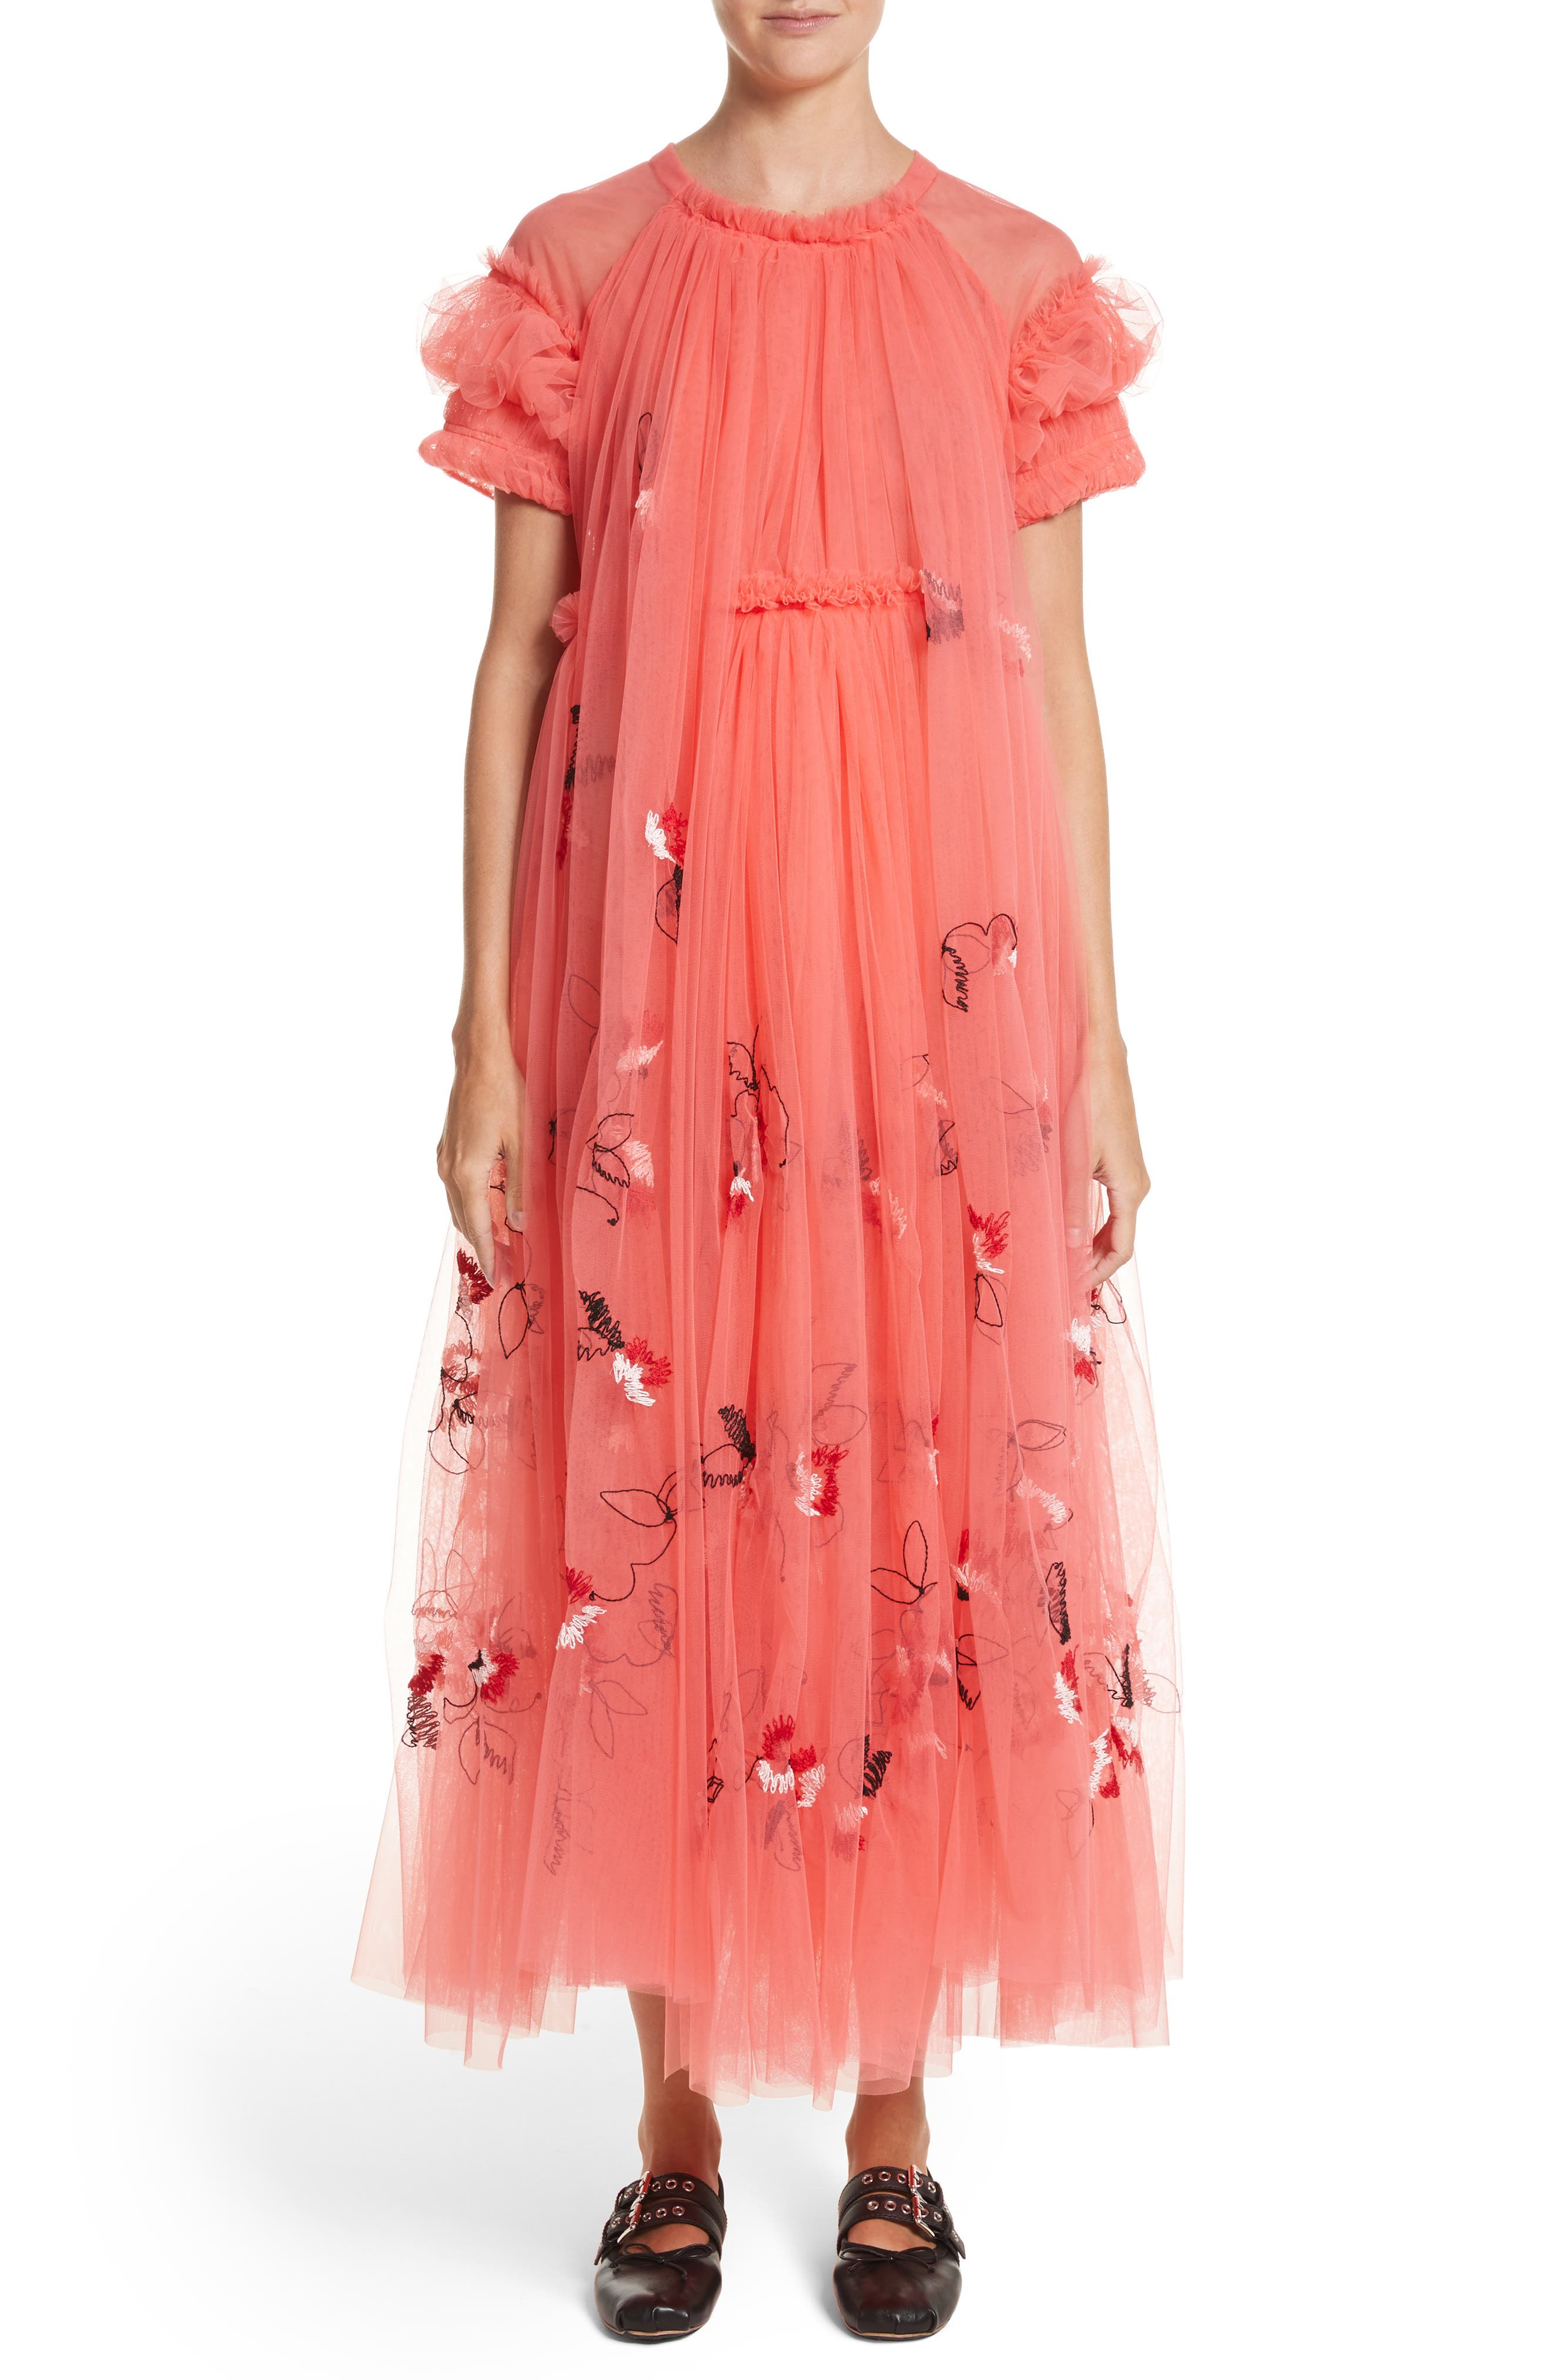 Main Image - Molly Goddard Doris Embroidered Tulle Dress